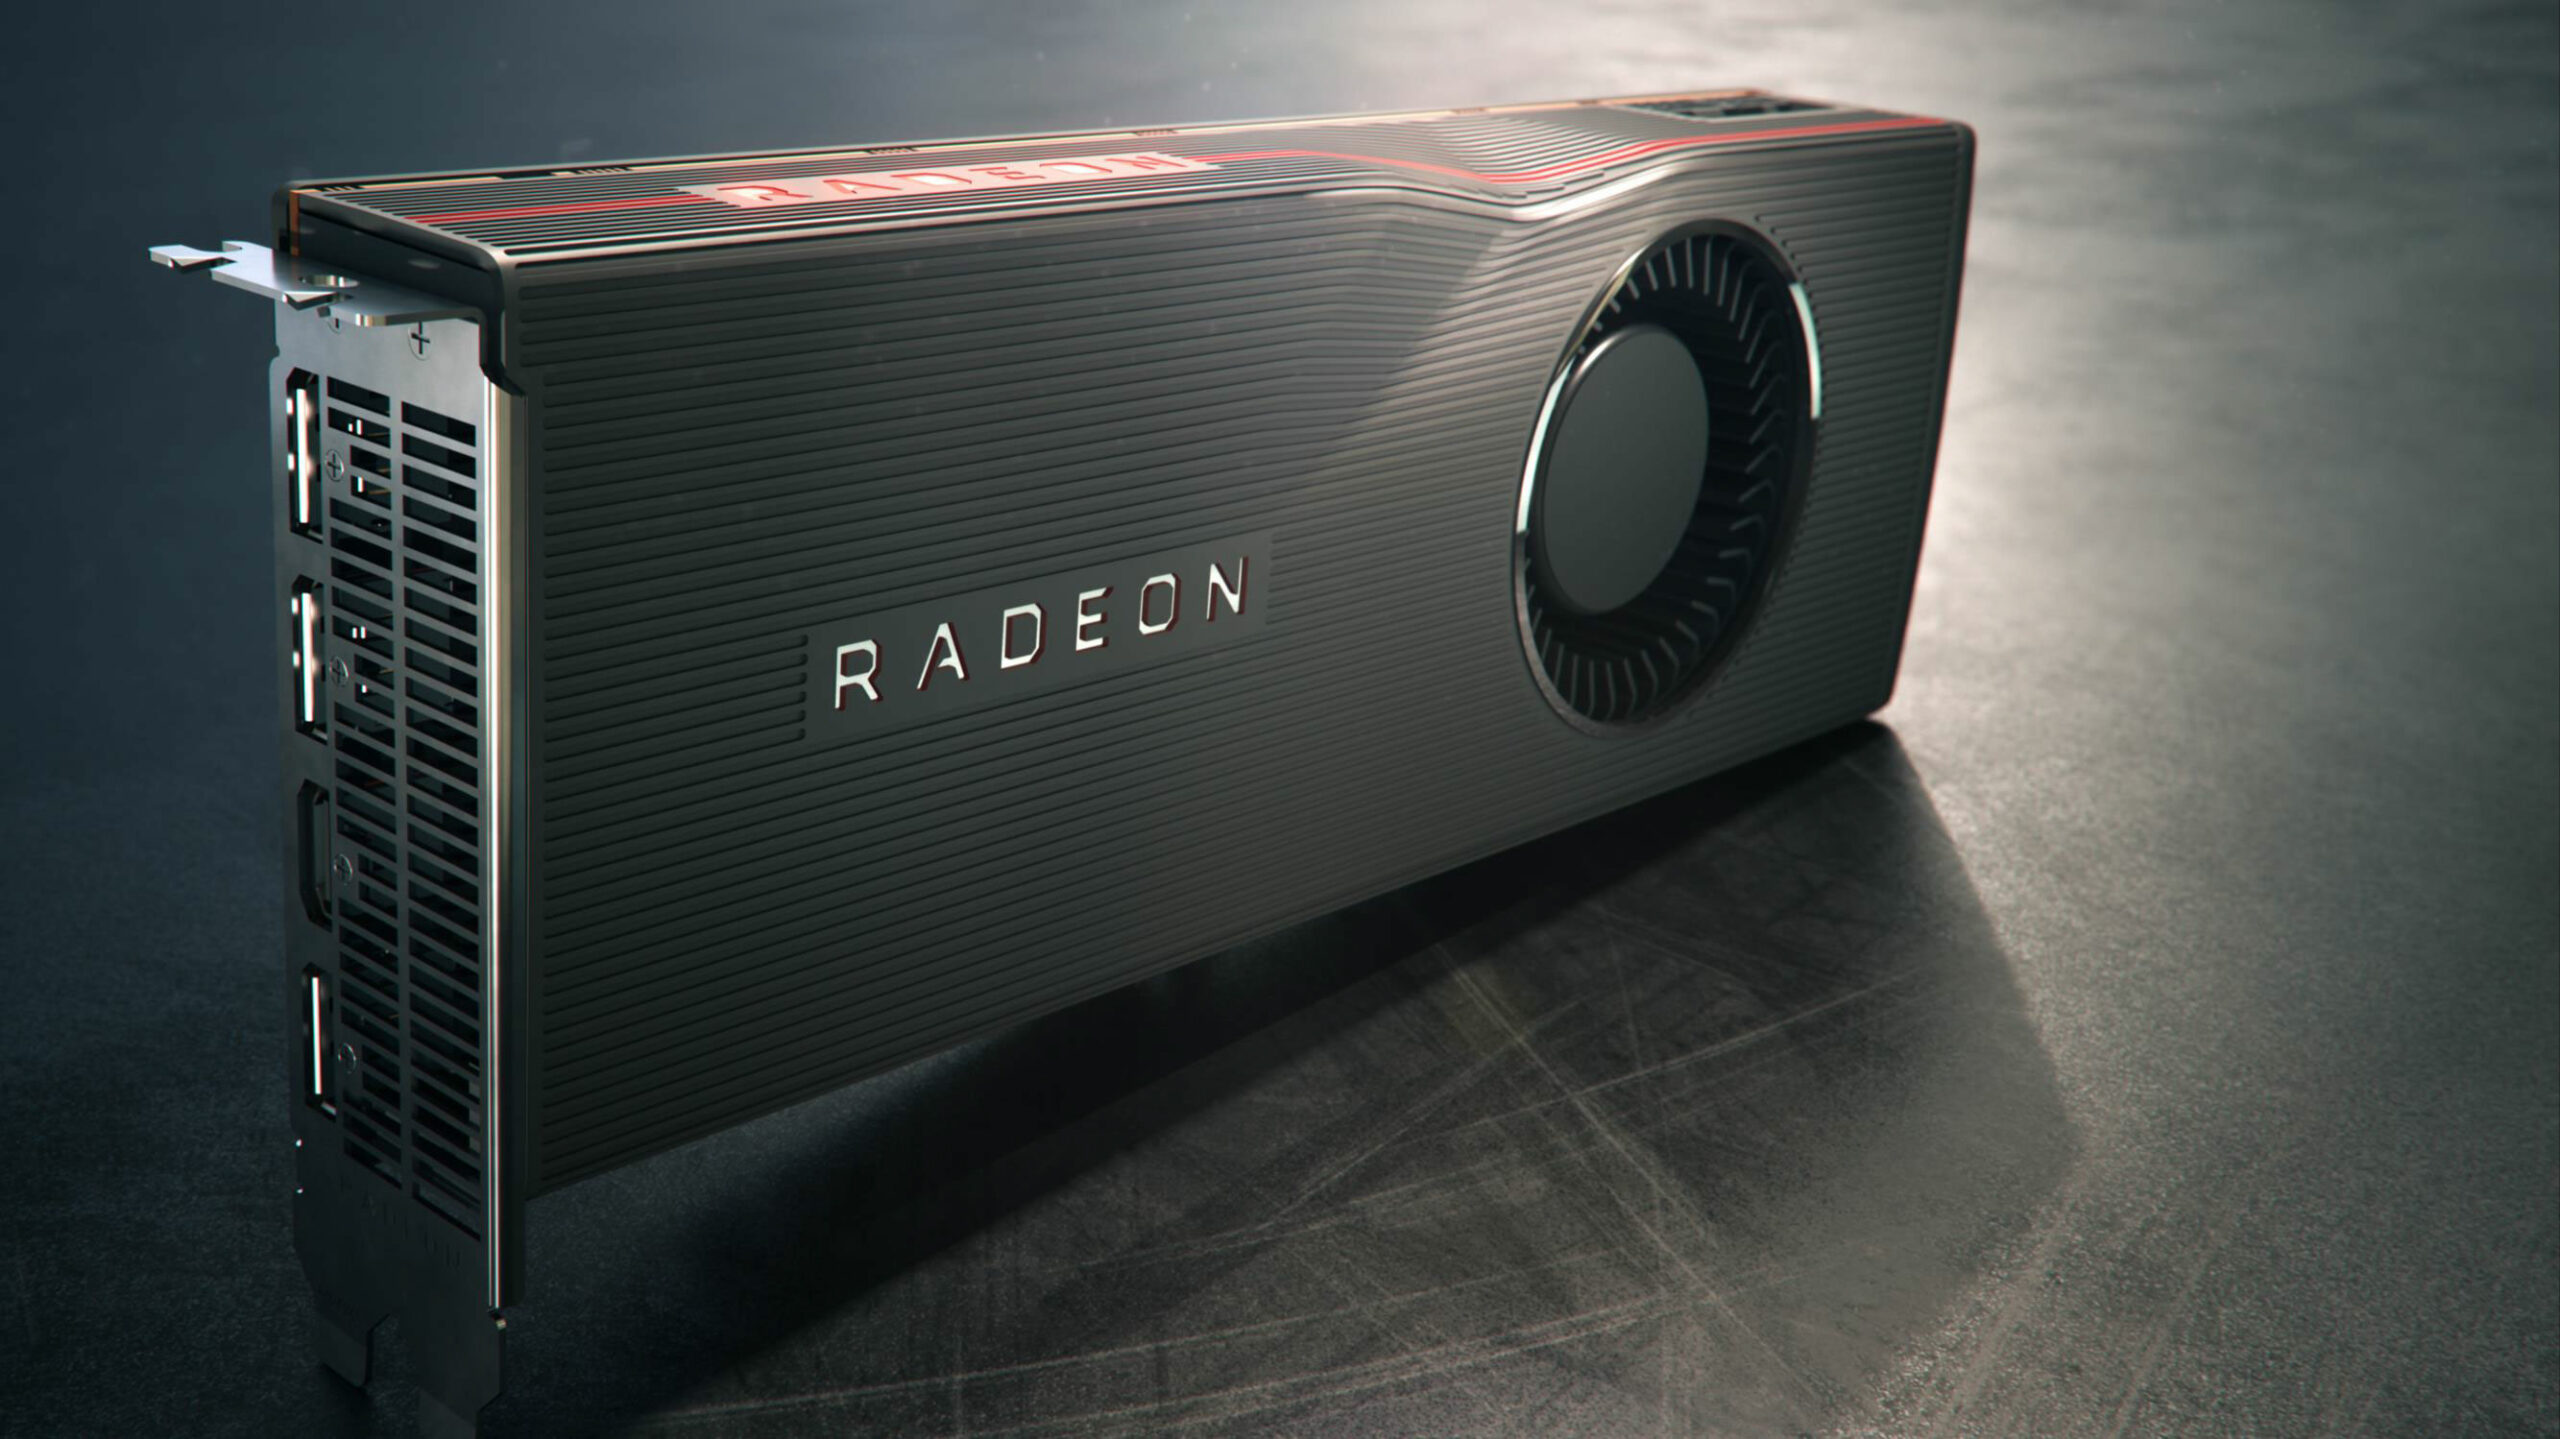 AMD Radeon RX 5700 XT scaled